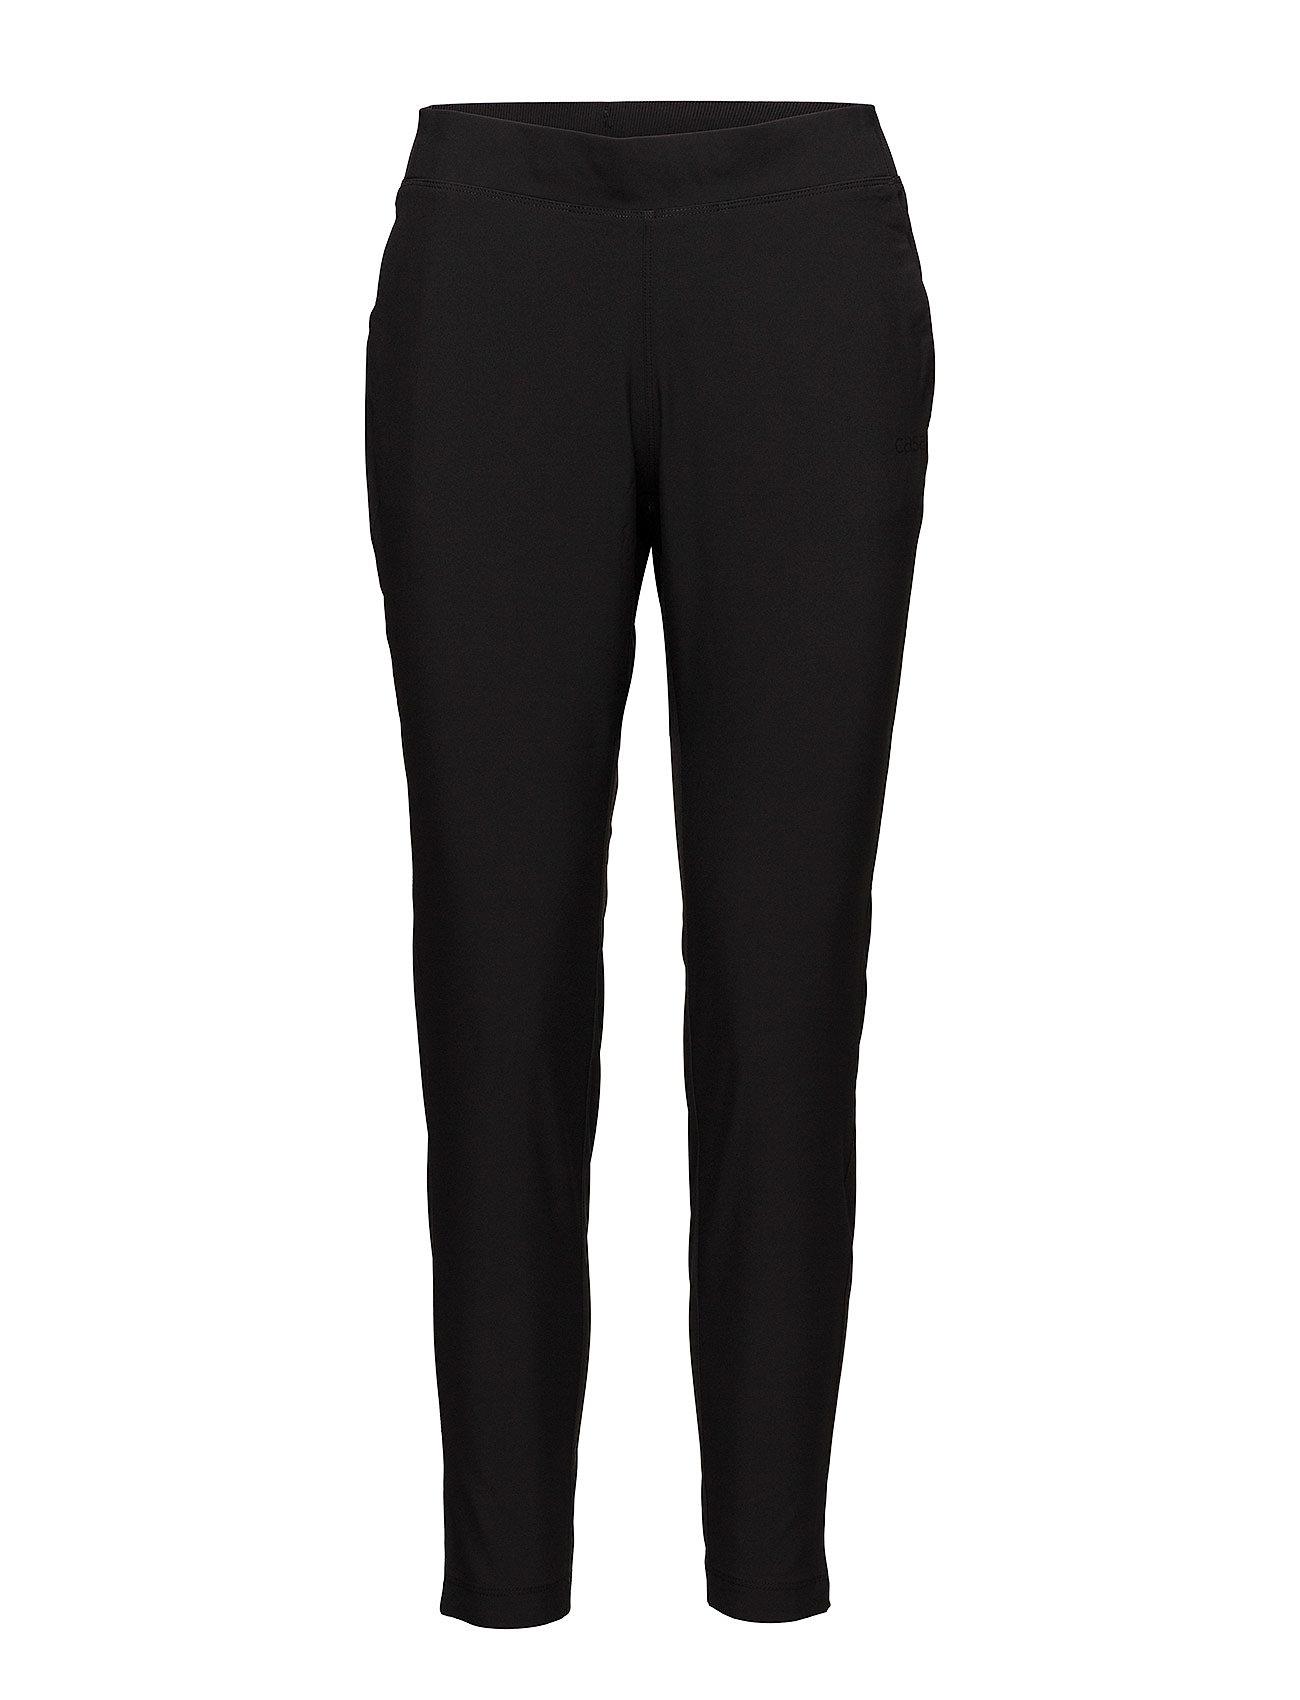 Casall Slim woven pants - BLACK